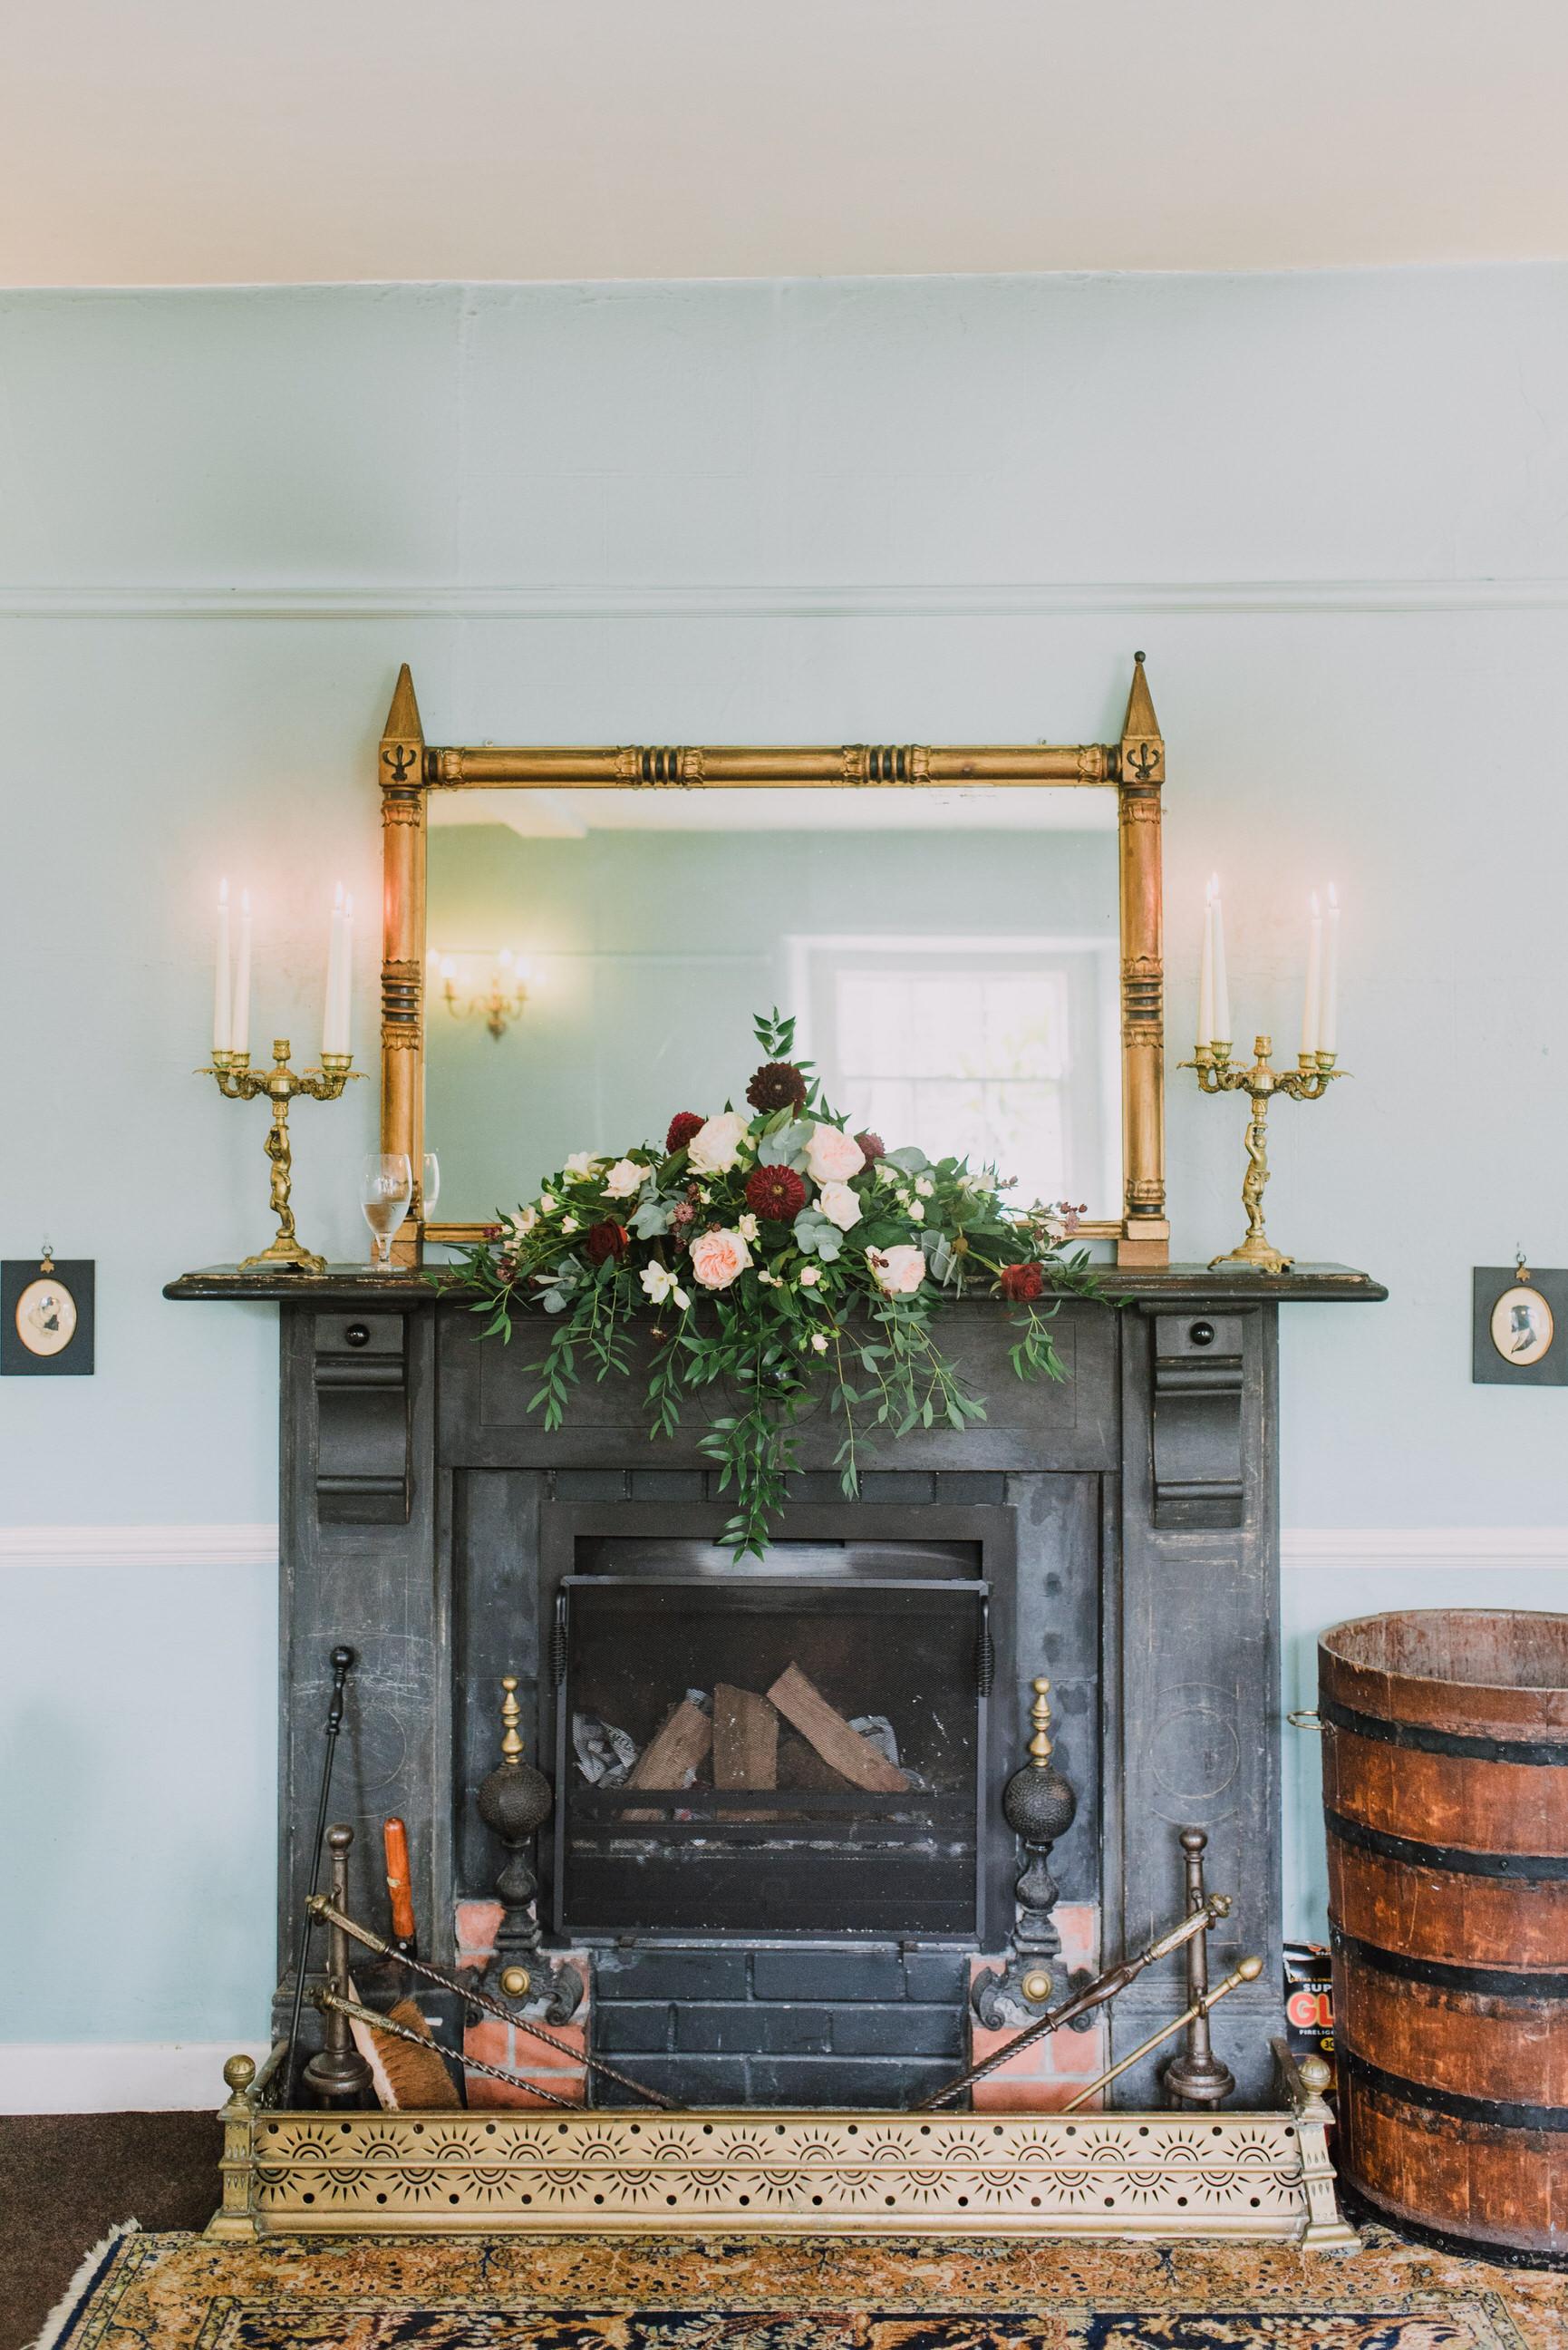 lissanoure castle wedding, northern ireland wedding photographer, romantic northern irish wedding venue, castle wedding ireland, natural wedding photography ni (25).jpg